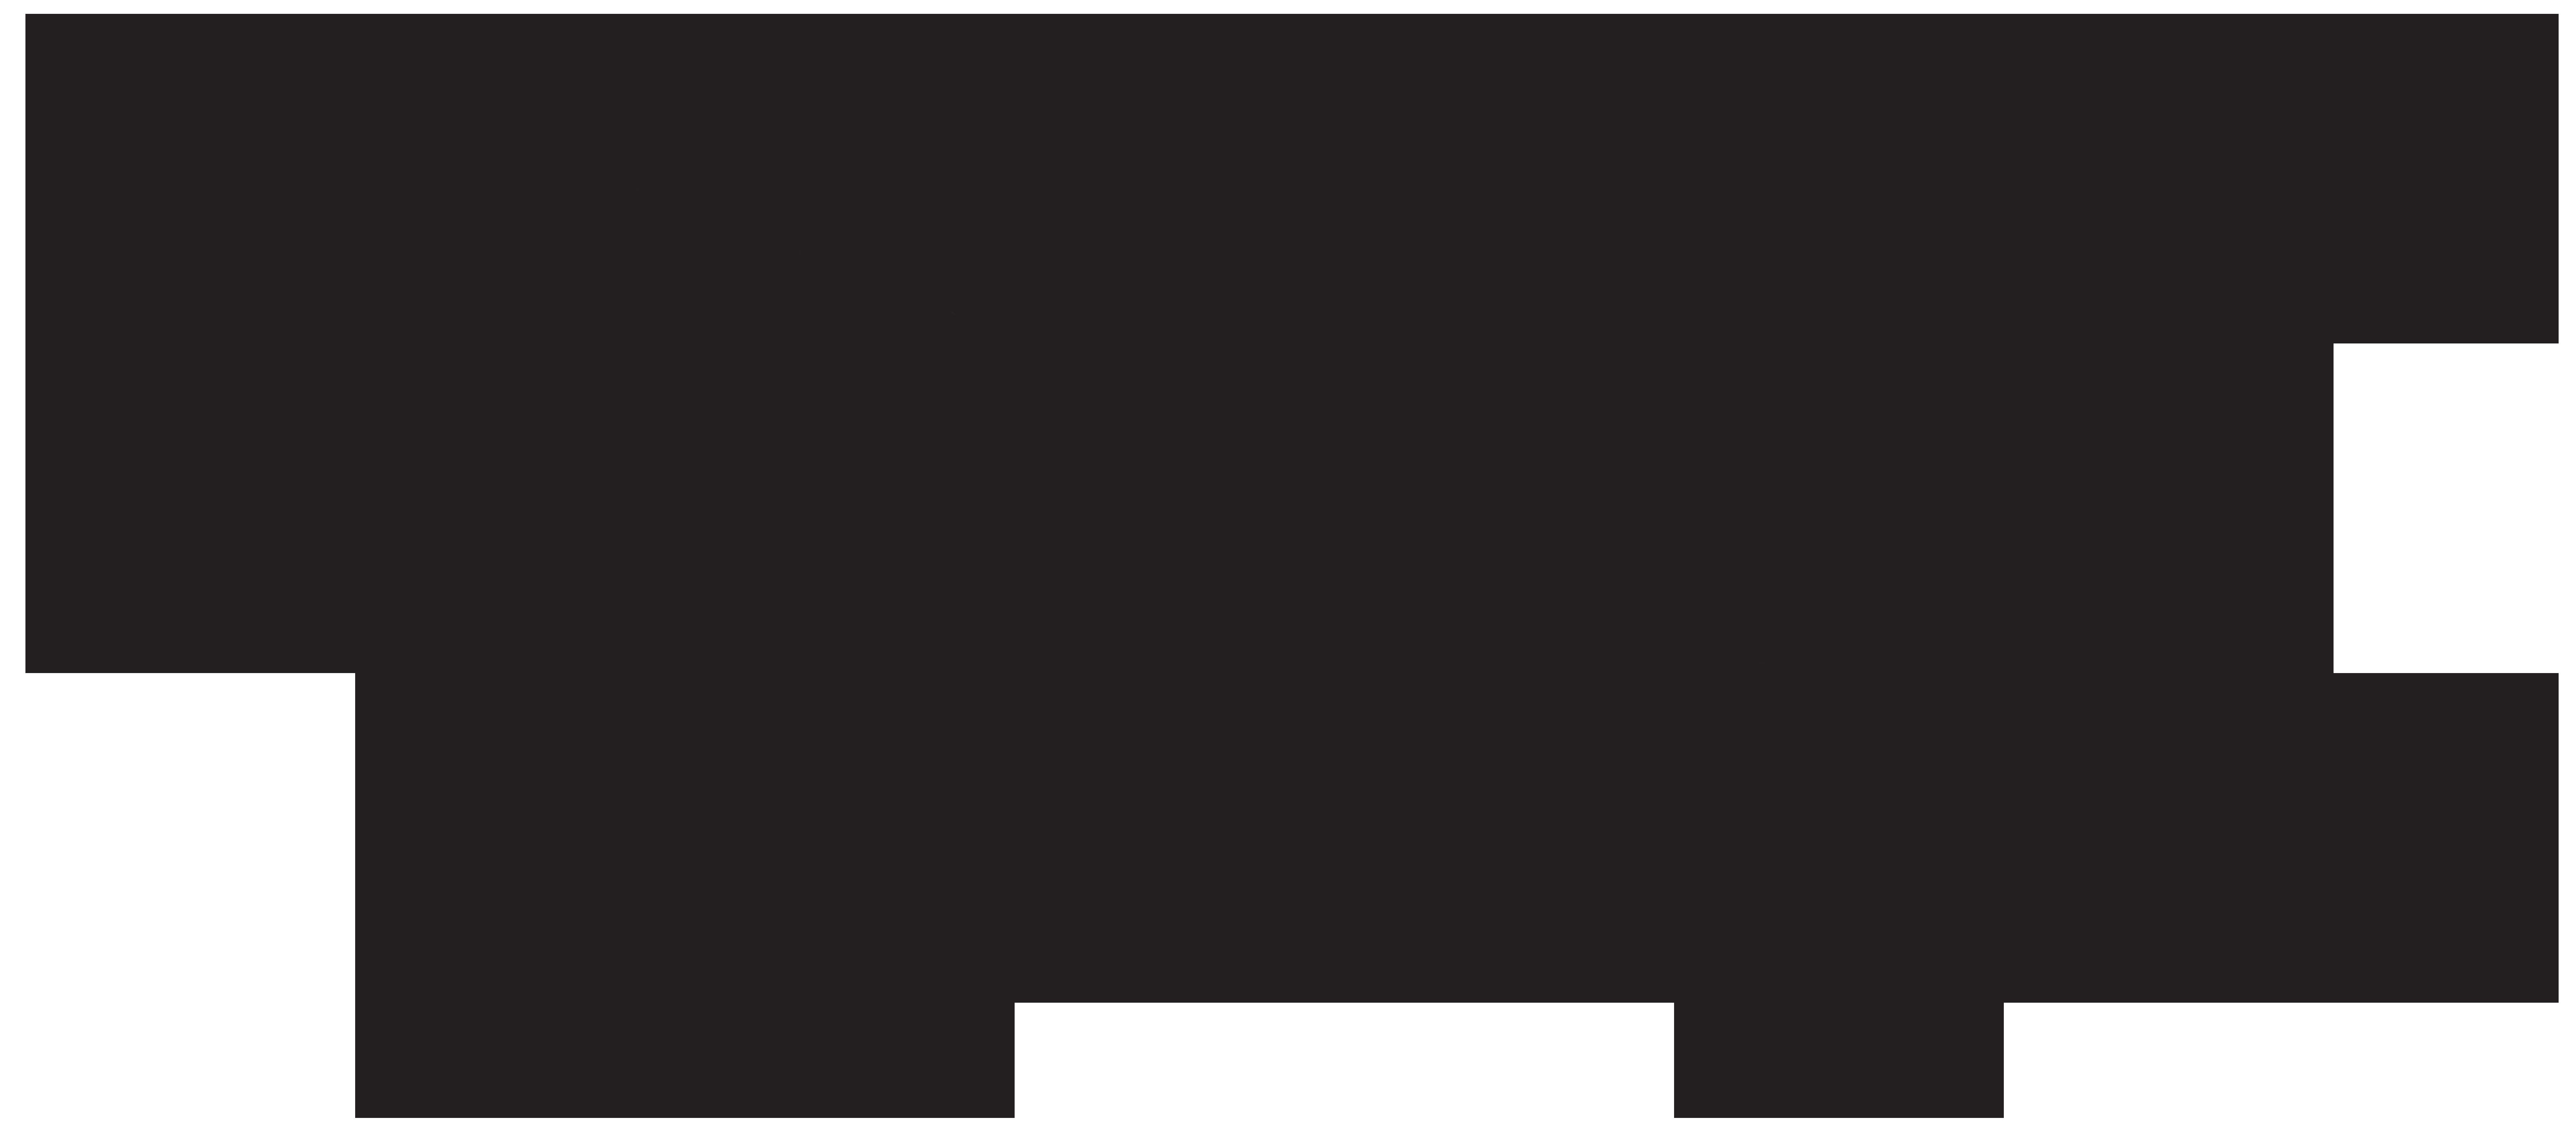 Pin by Kumar Kumar on plane in 2019.